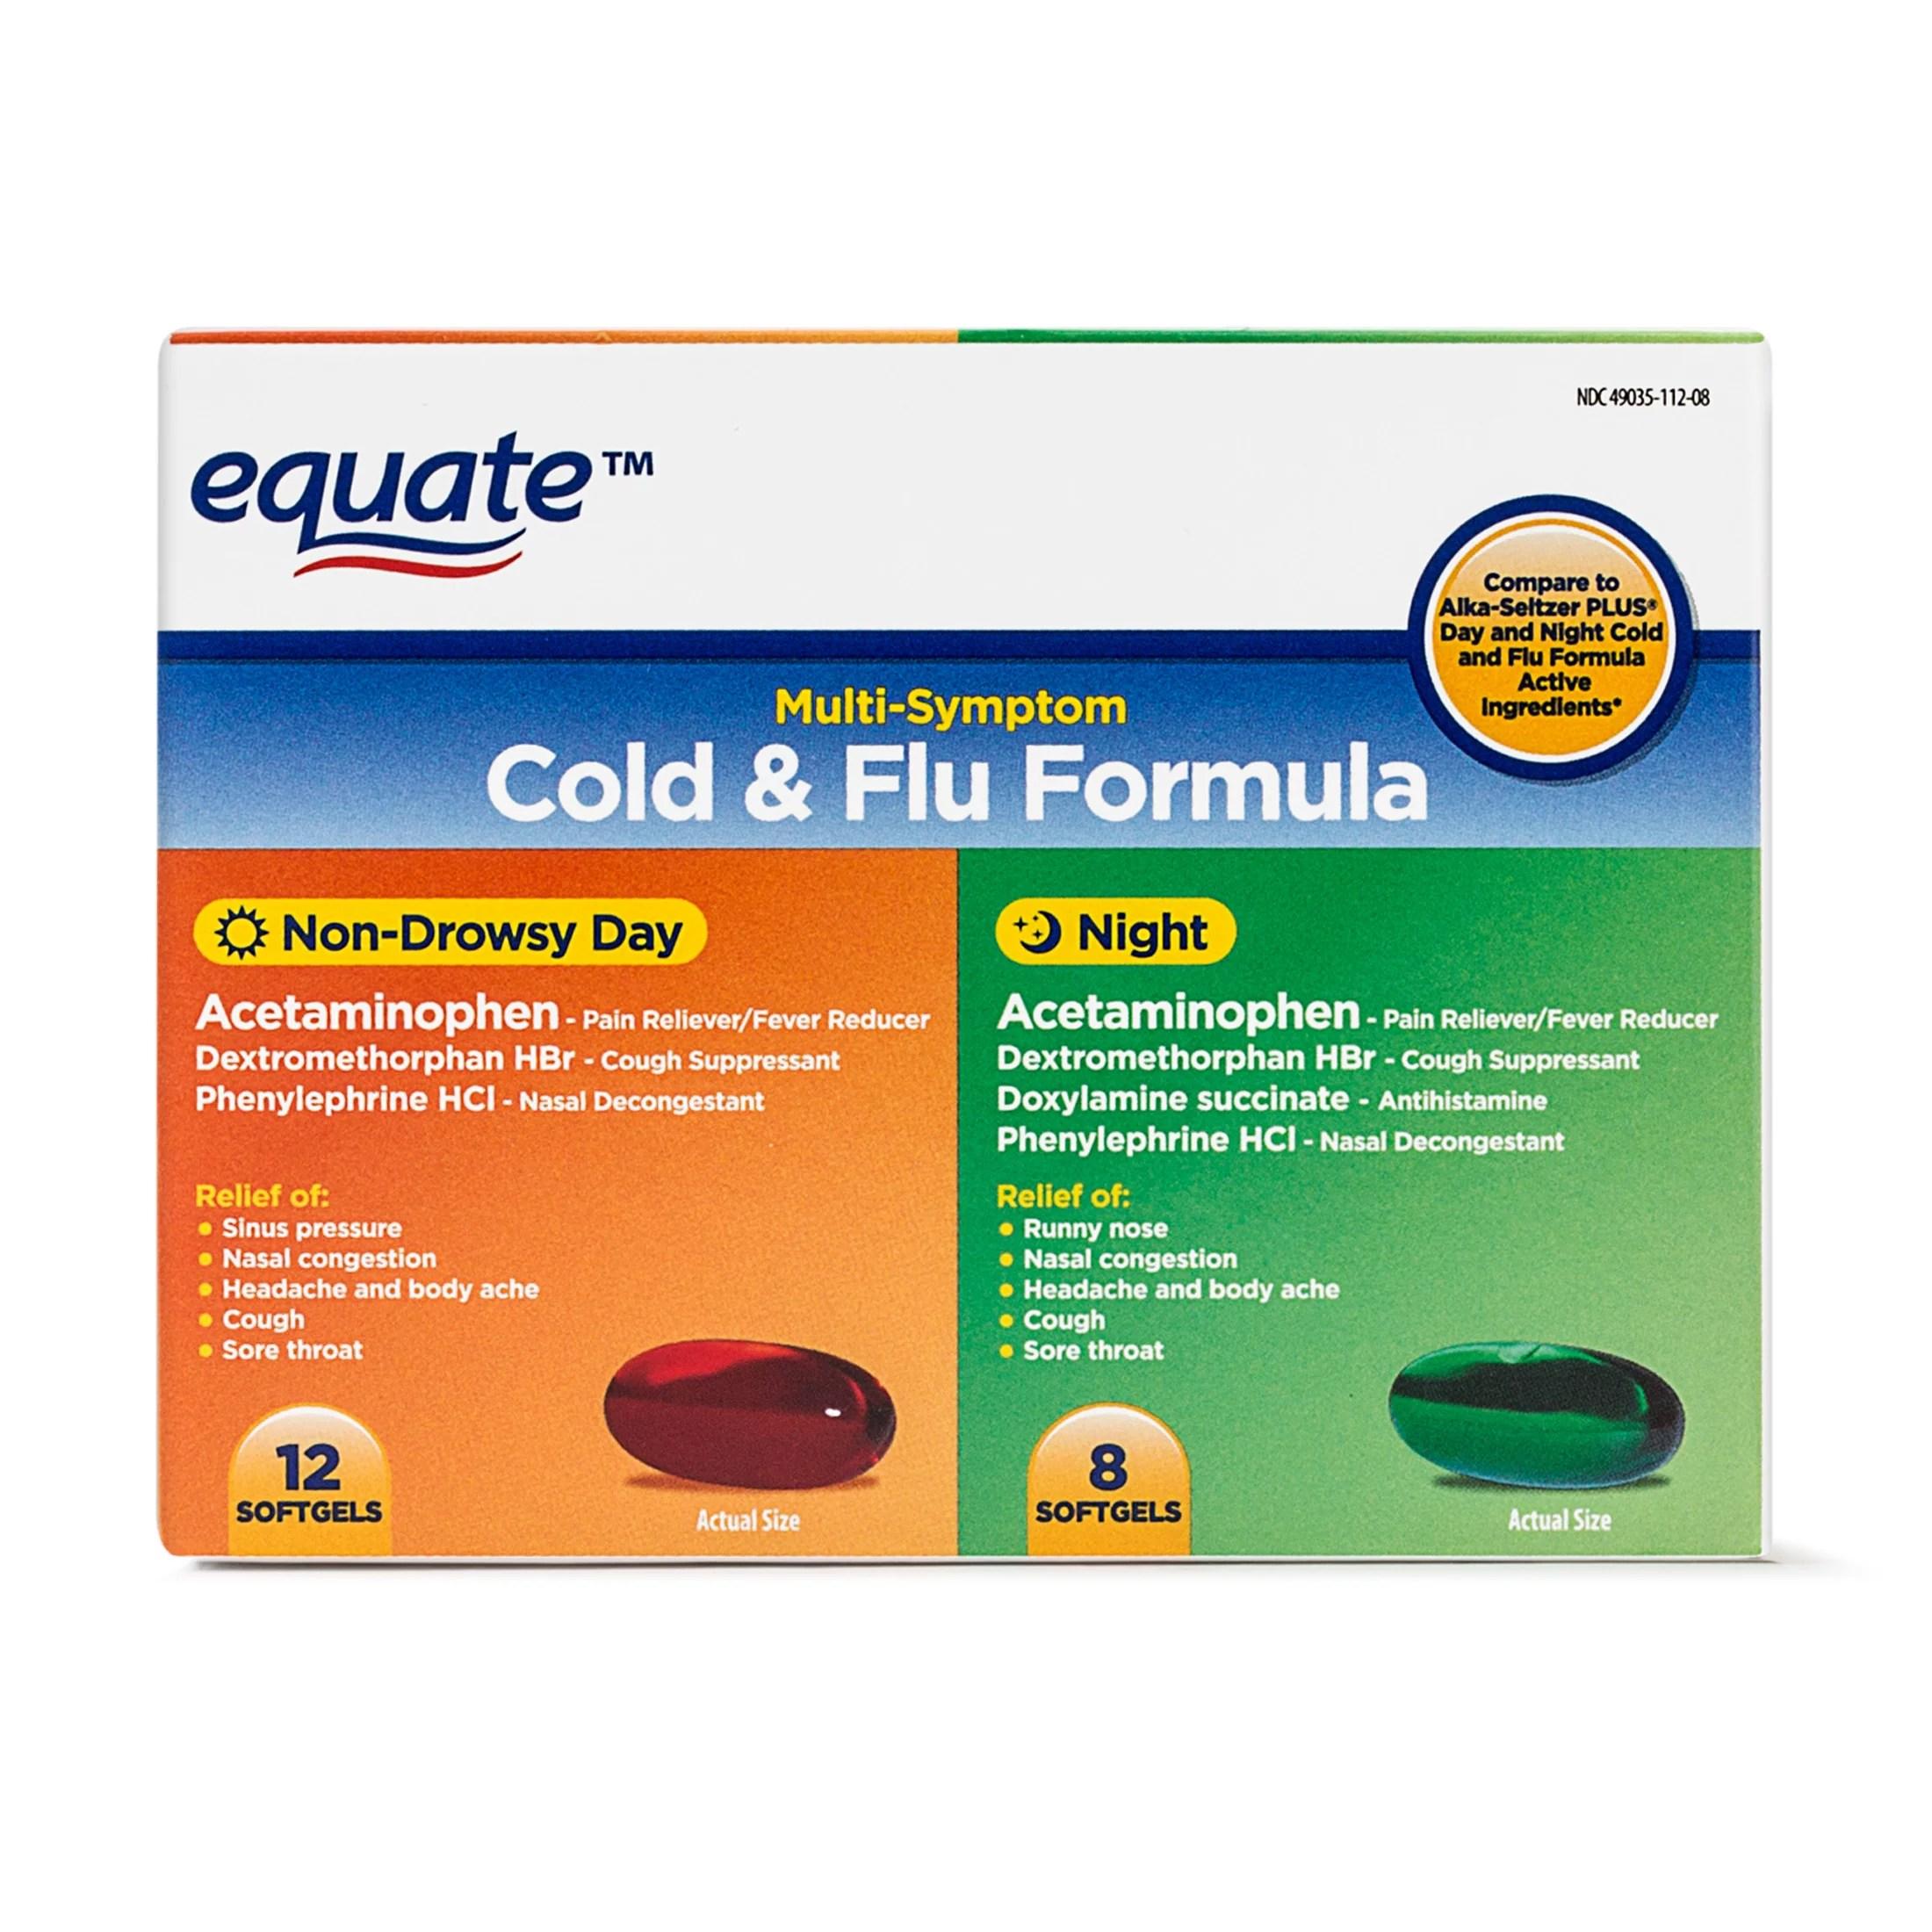 Equate Cold & Flu Formula, 12 Non-Drowsy Softgels, 8 Night ...